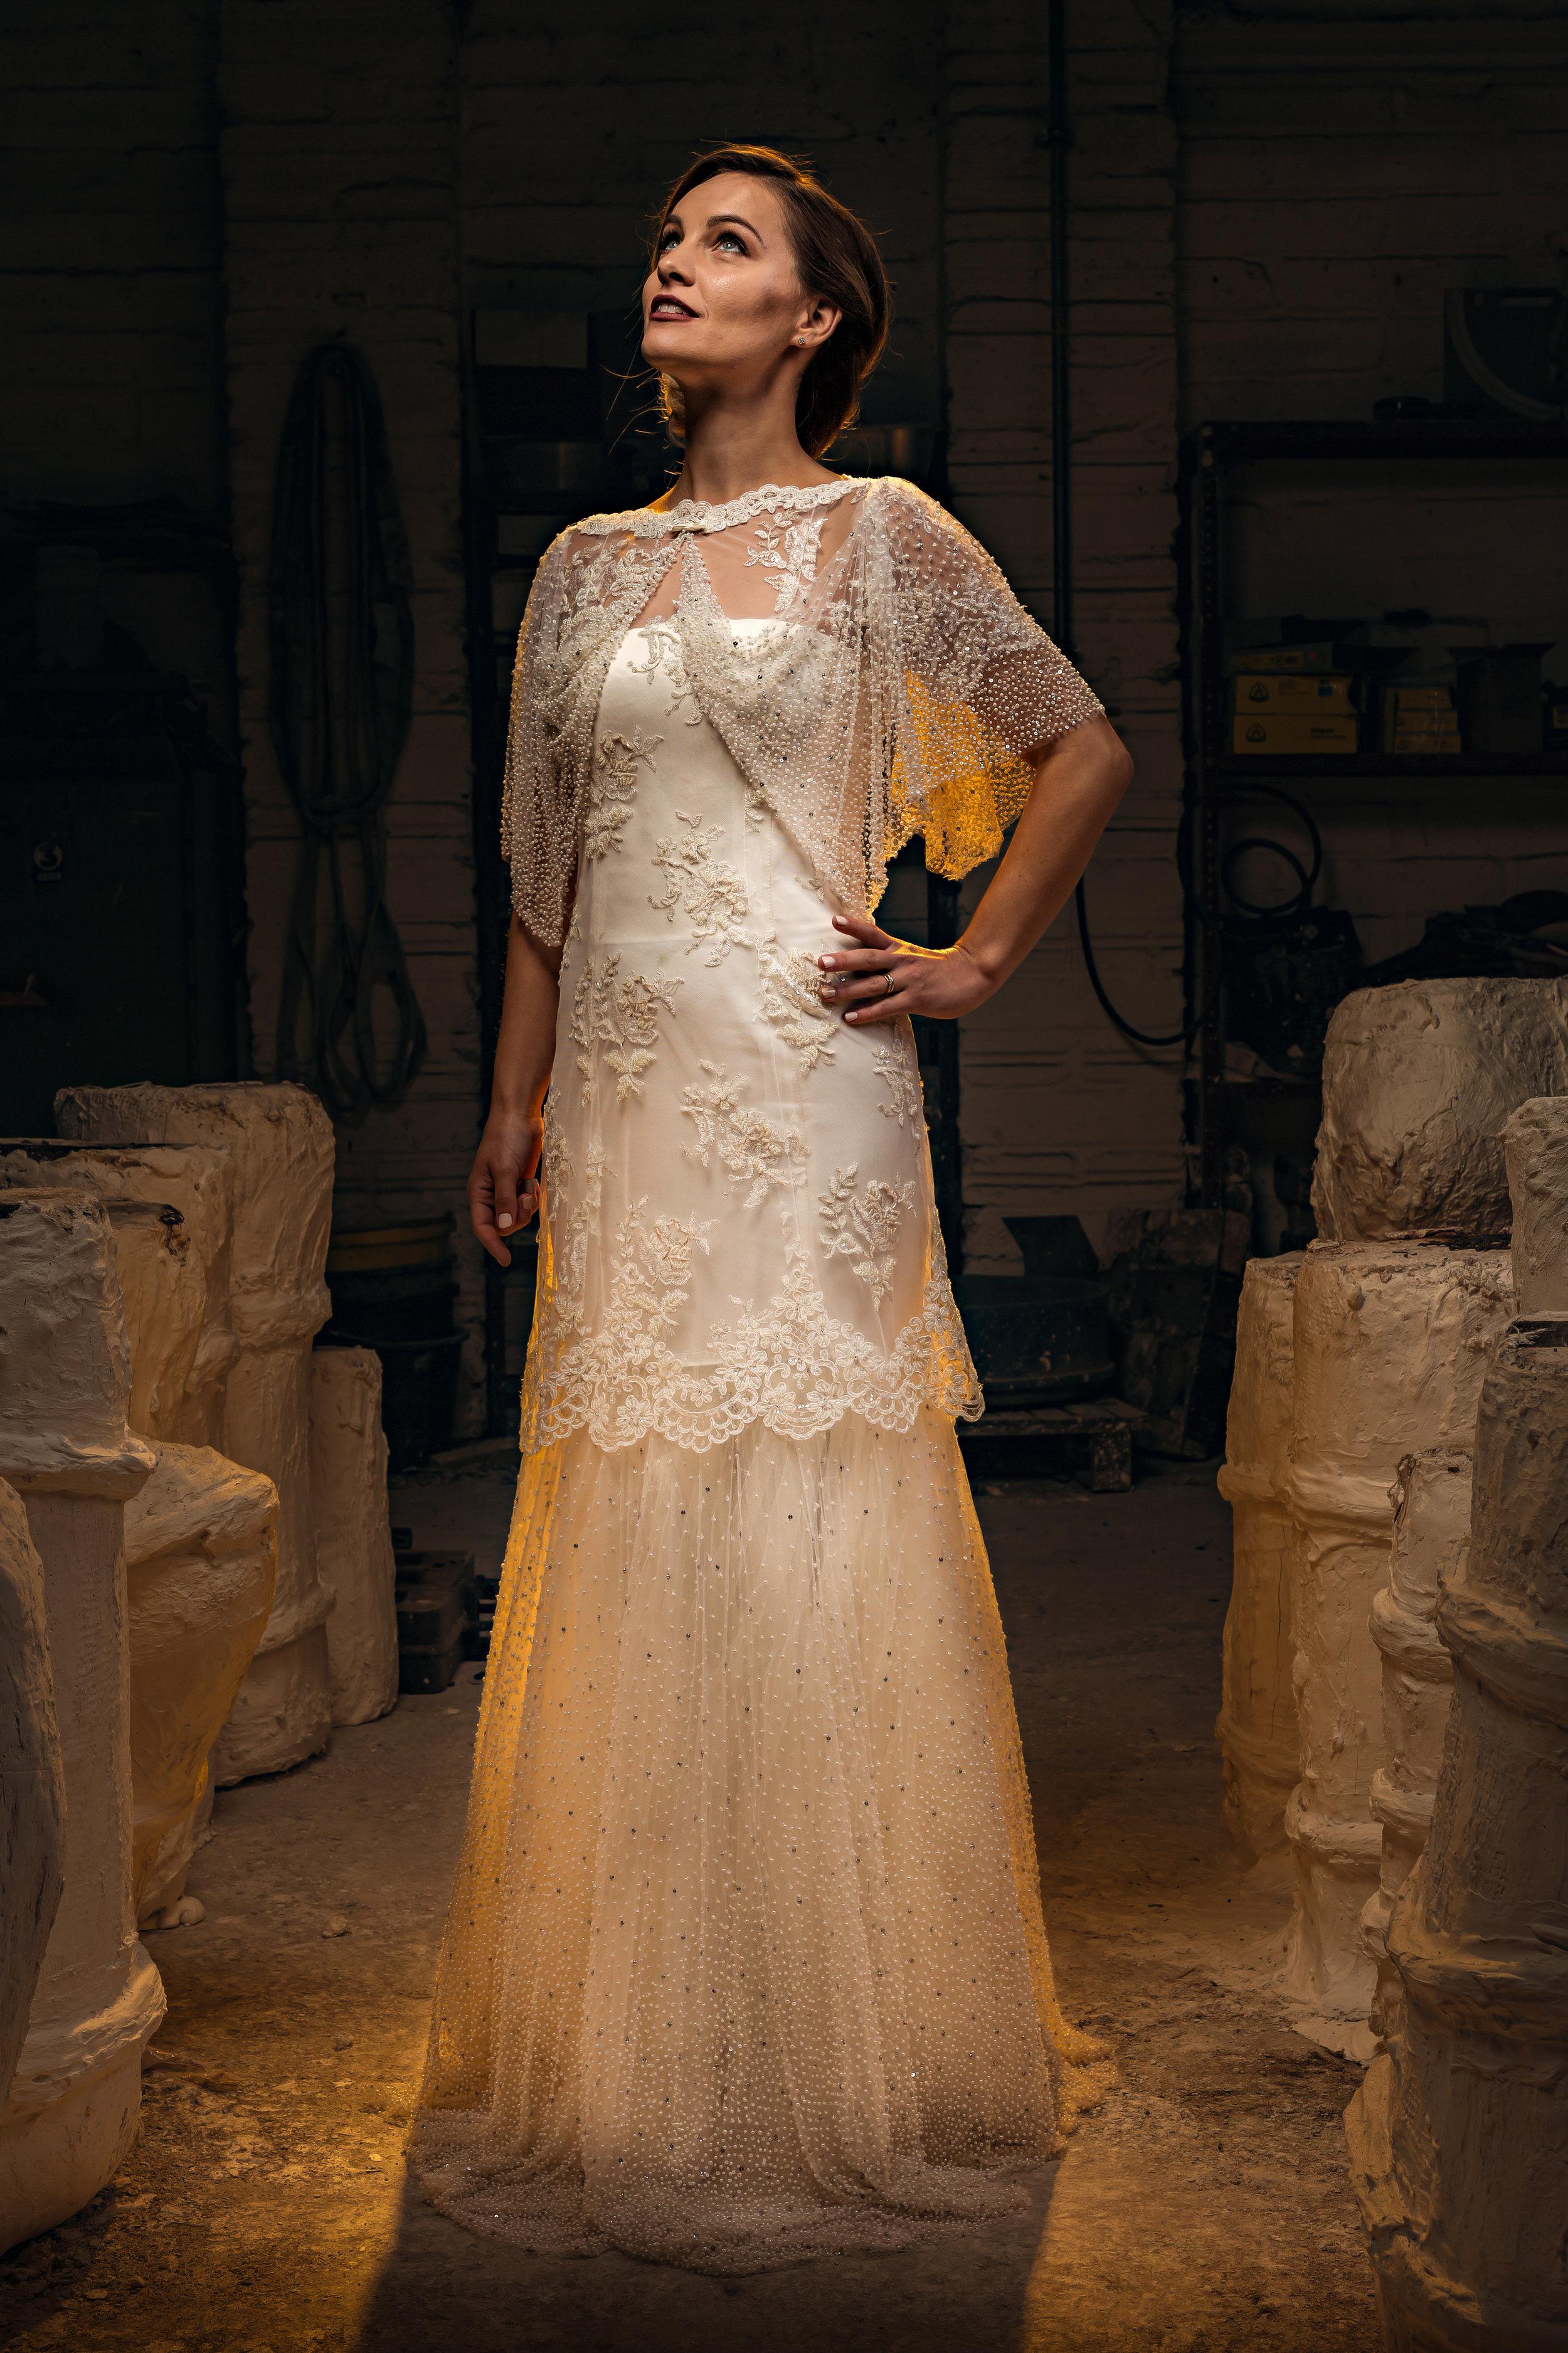 Martin Dobson Couture - Bespoke wedding dress - Suffolk - 0360 - September 17, 2017 - copyright Foyers Photography-Edit--® Robert Foyers - All Rights Reserved-3388 x 5084.JPG